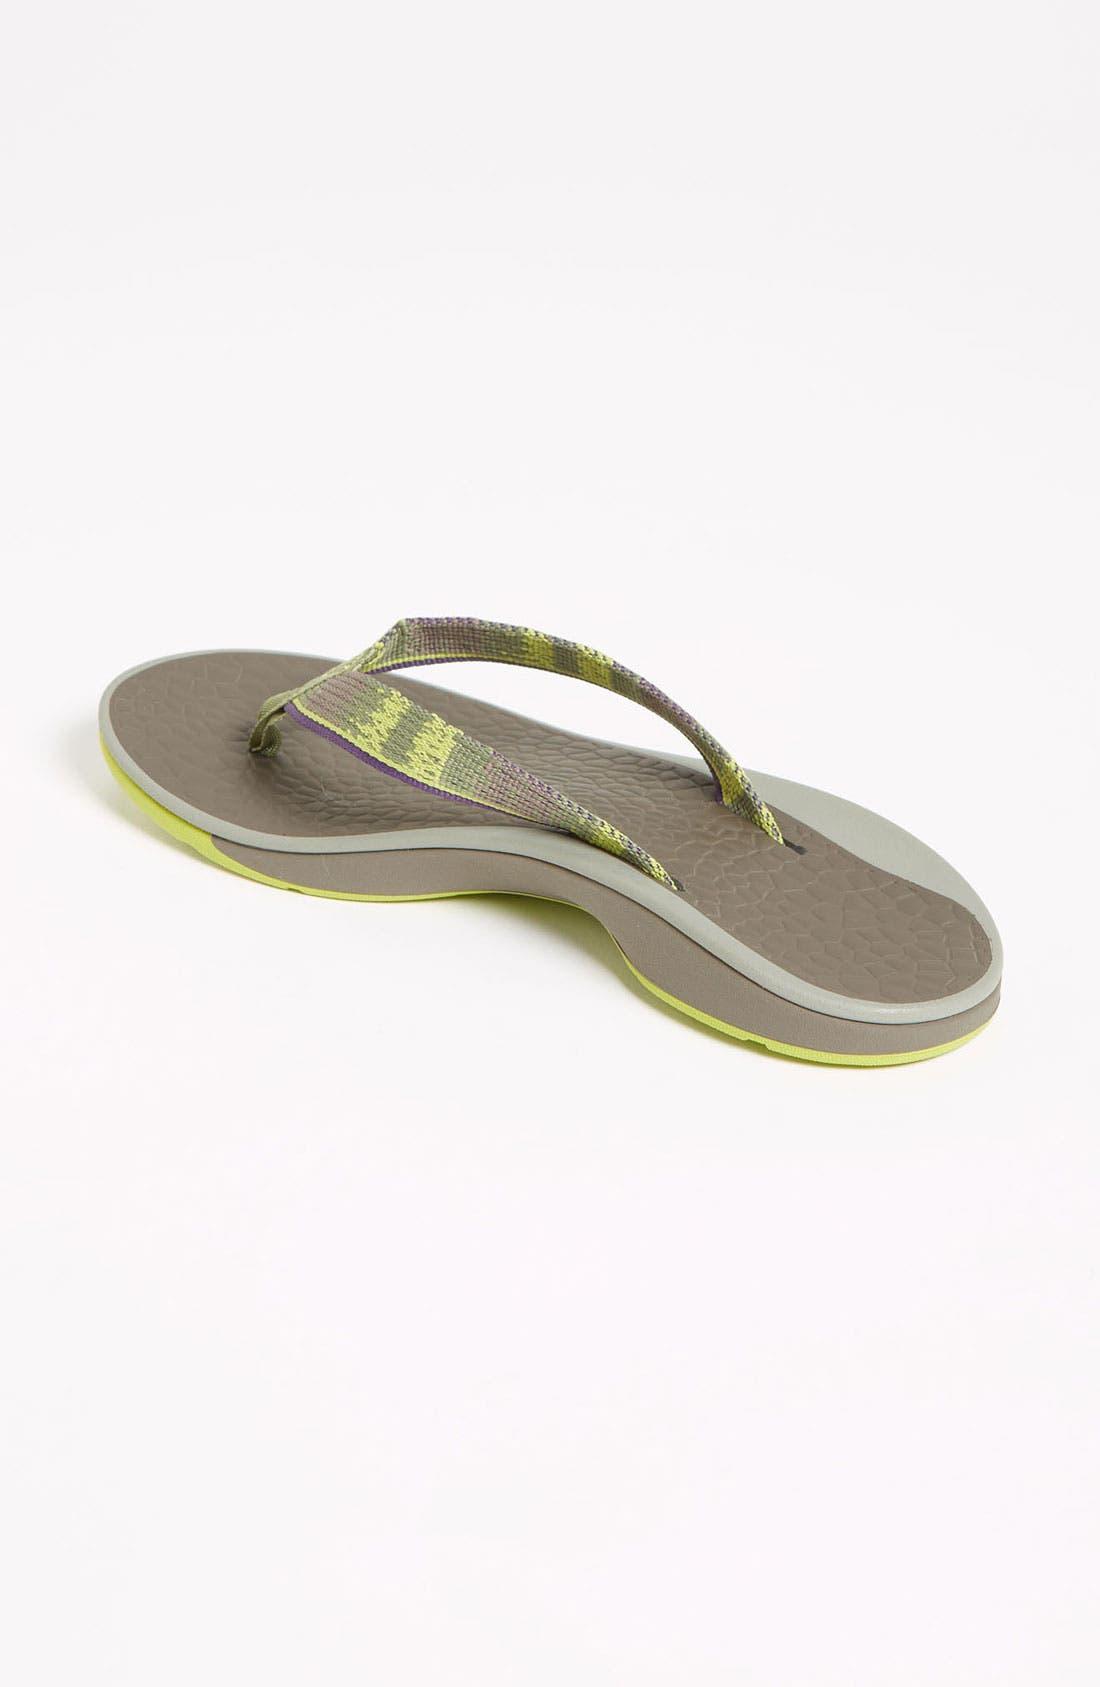 Alternate Image 2  - Chaco 'Fathom' Sandal